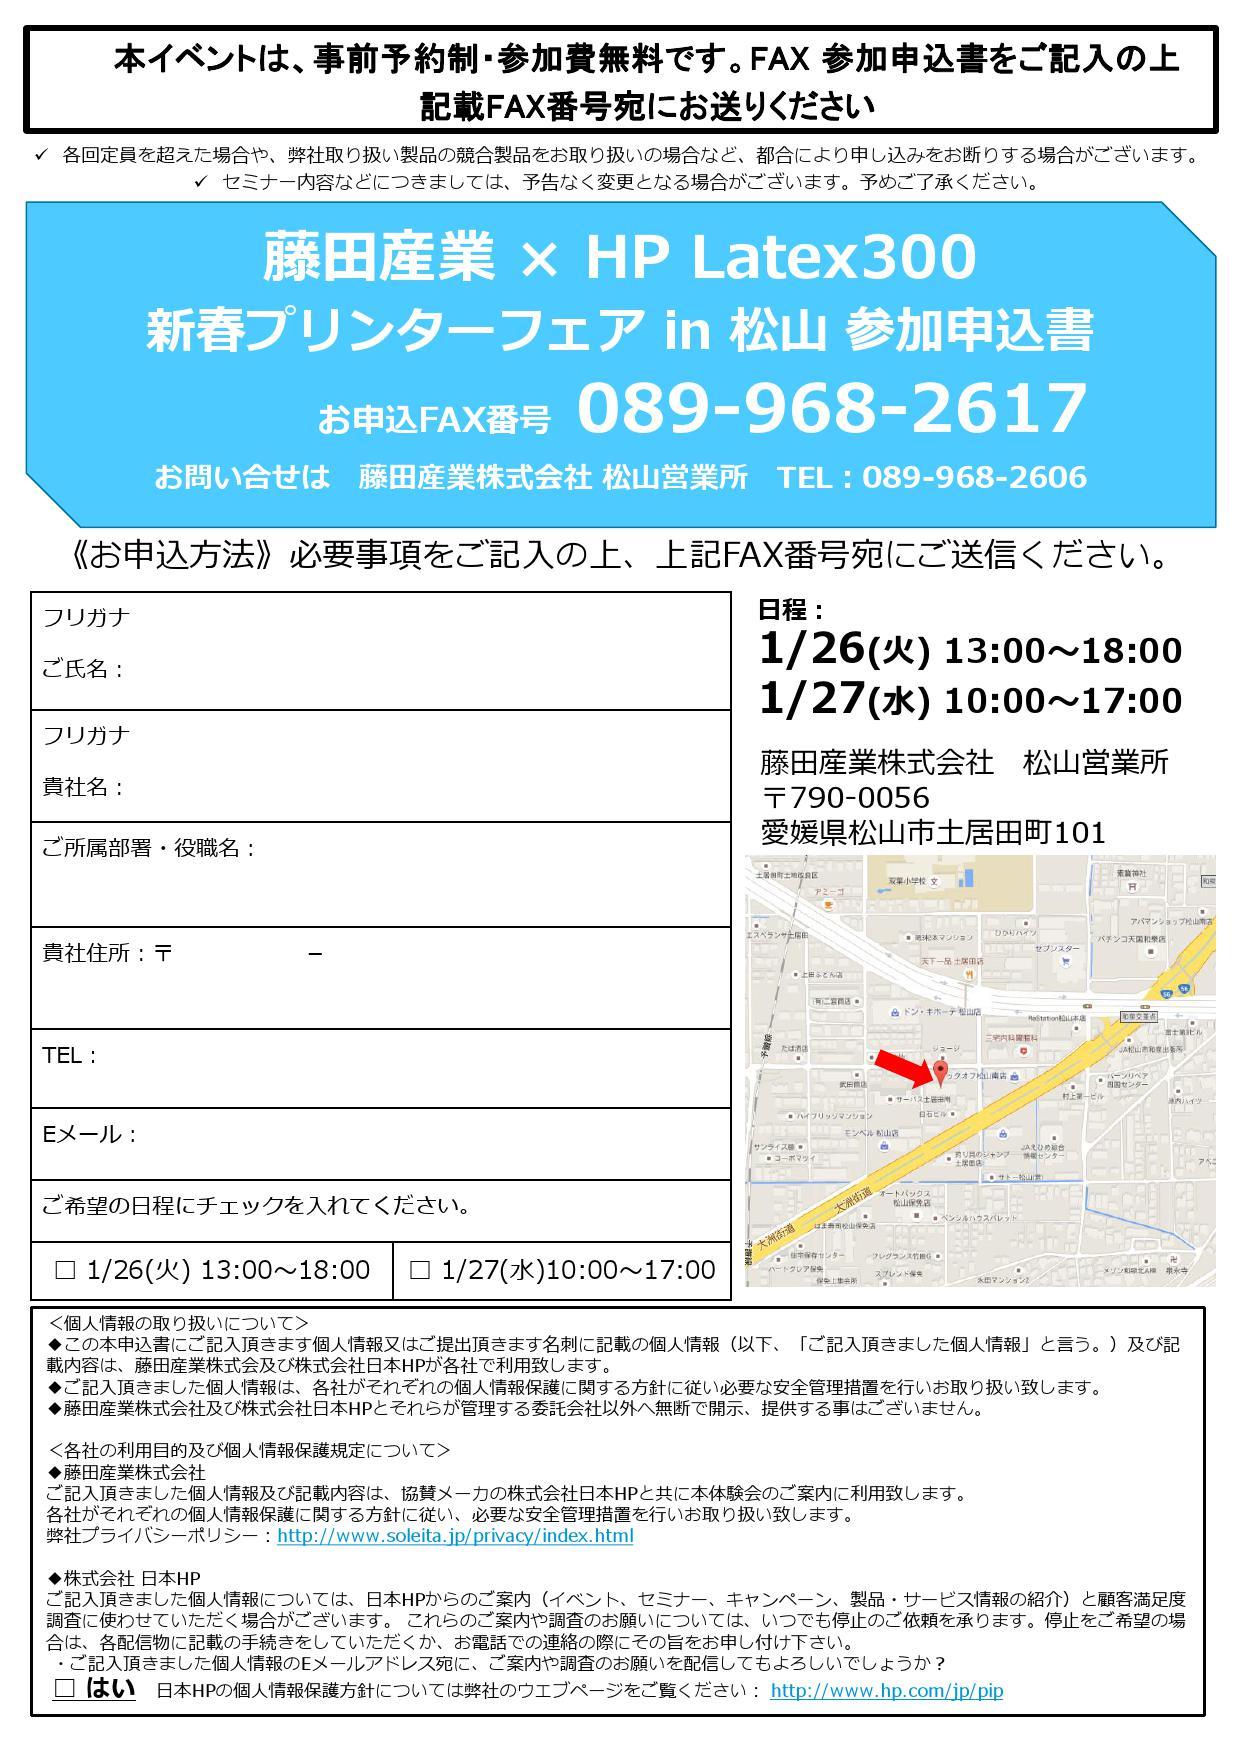 Fujita_Latex300フェアチラシ松山a_000002